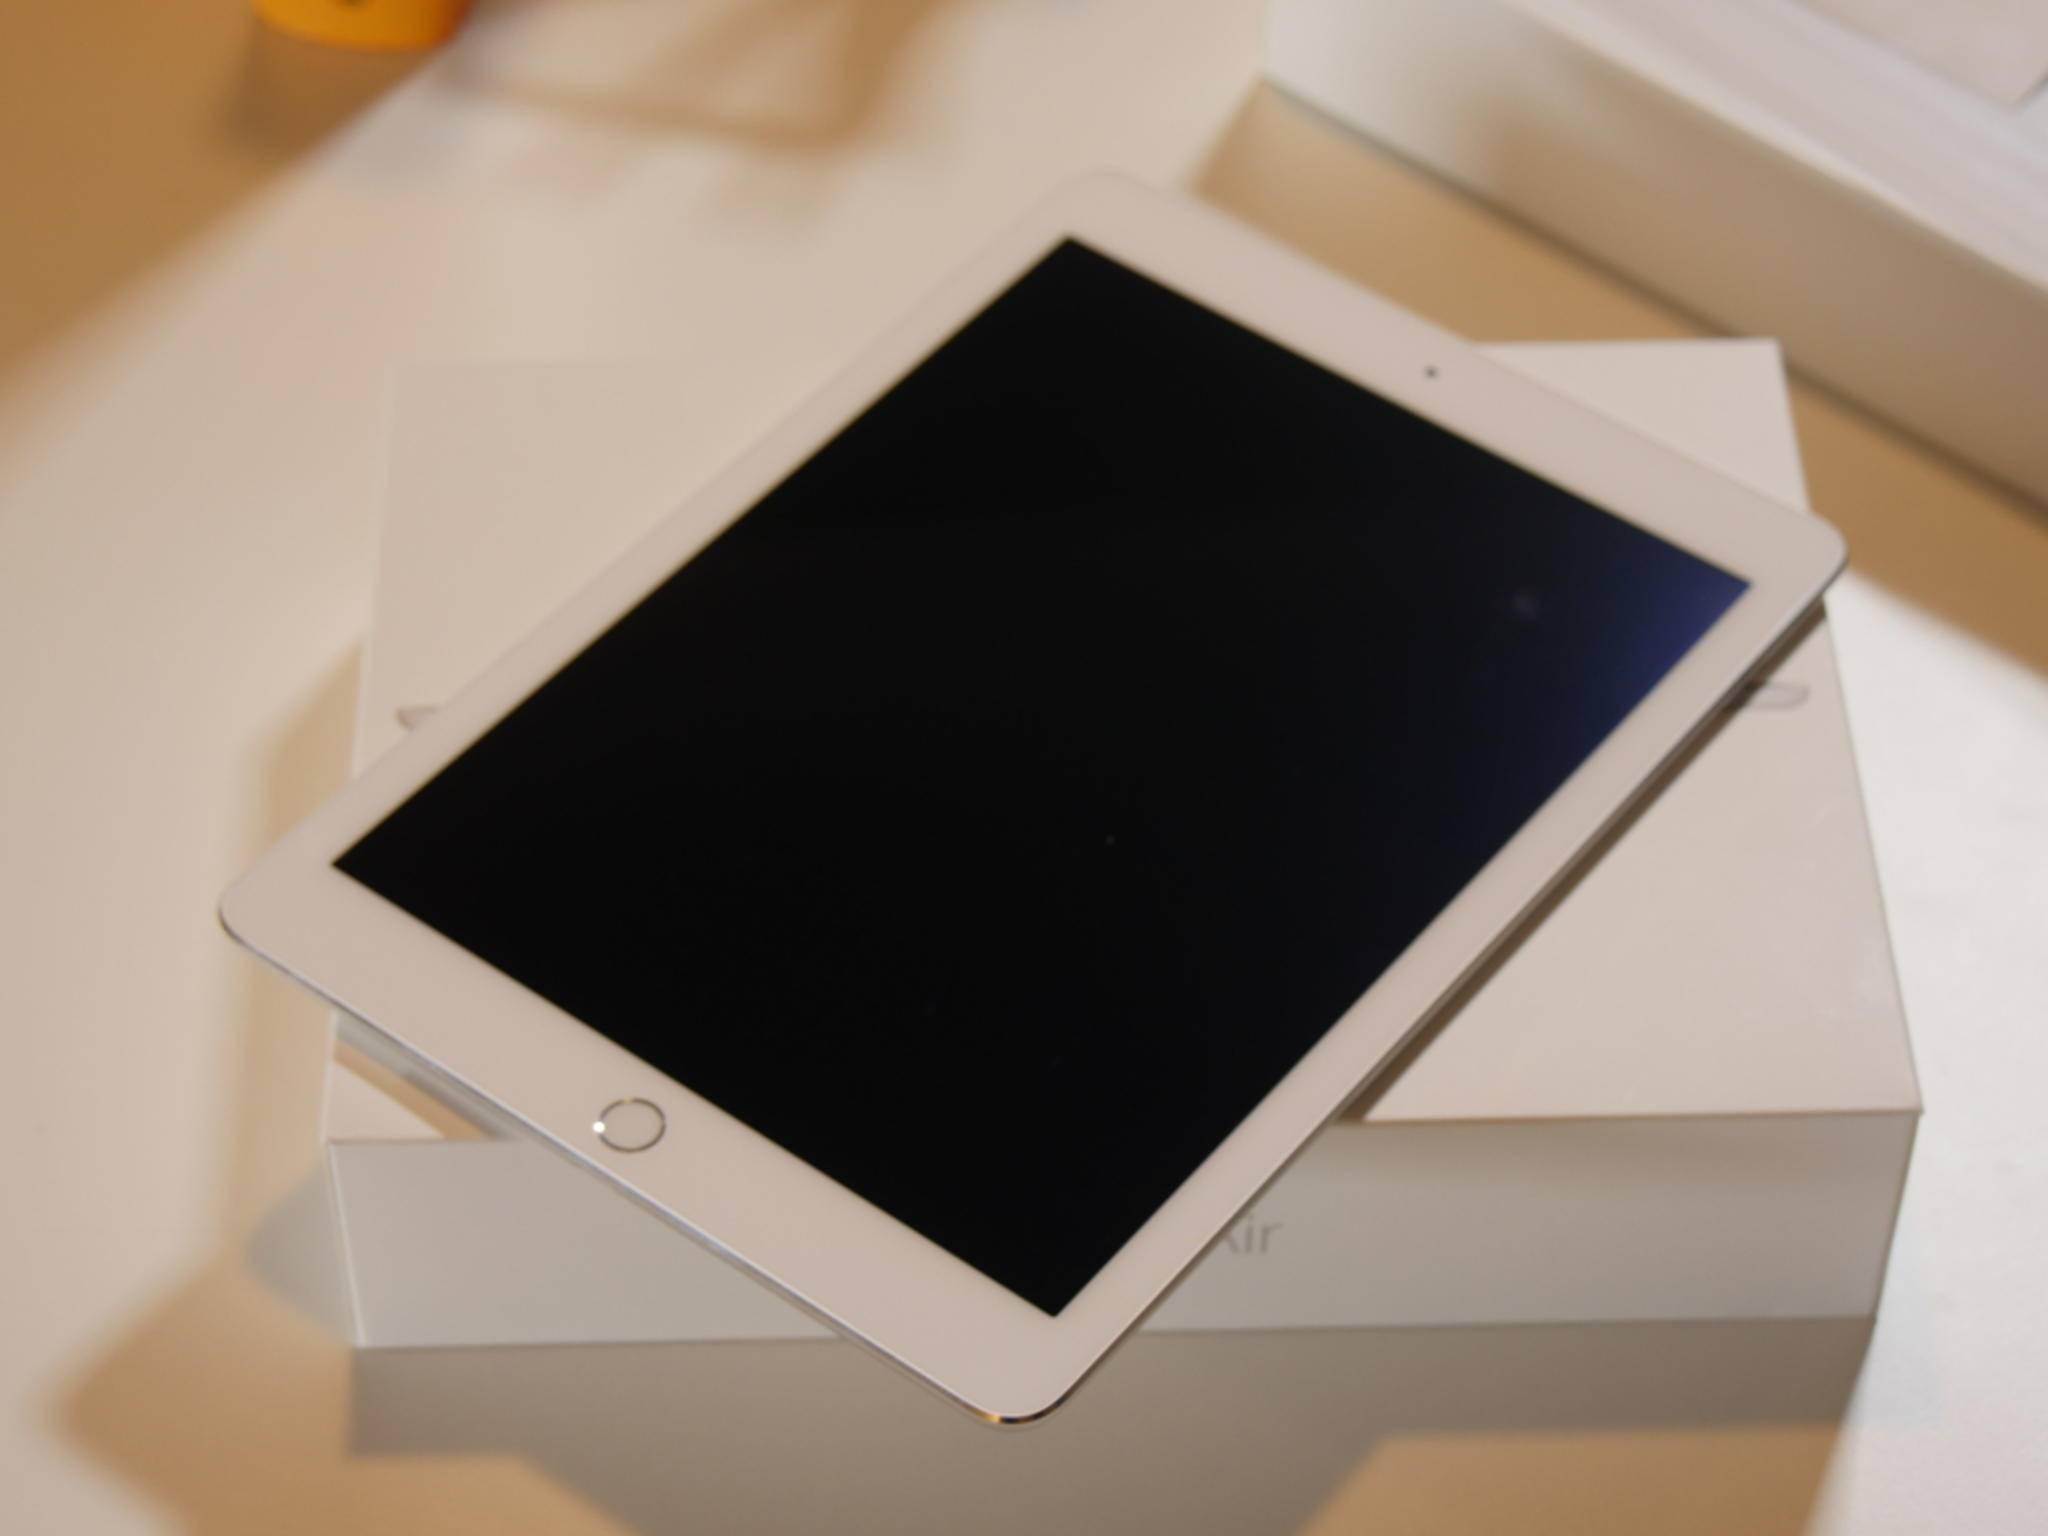 Das Display des iPad Air 2 ist noch immer 9,7 Zoll groß.